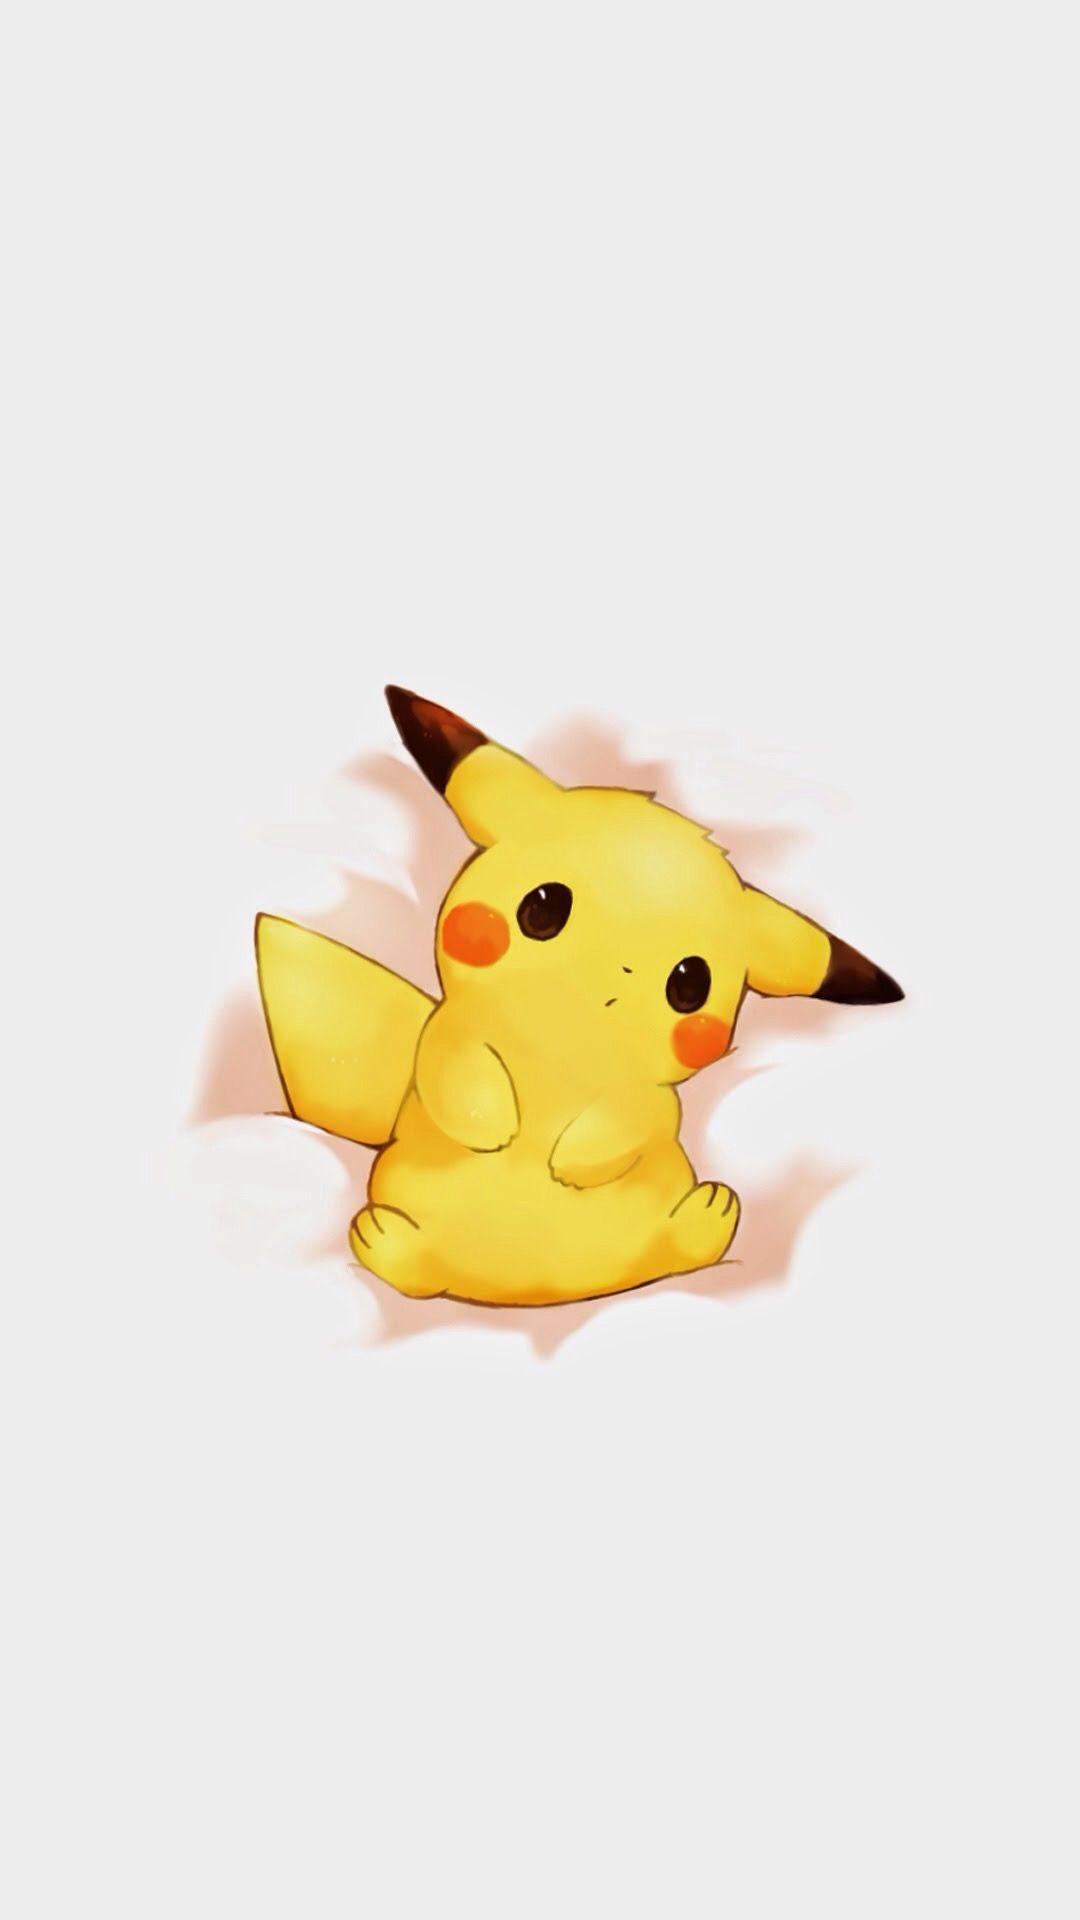 Pin By Limsa Liza On Pikachu Pikachu Wallpaper Iphone Cute Cartoon Wallpapers Pikachu Drawing